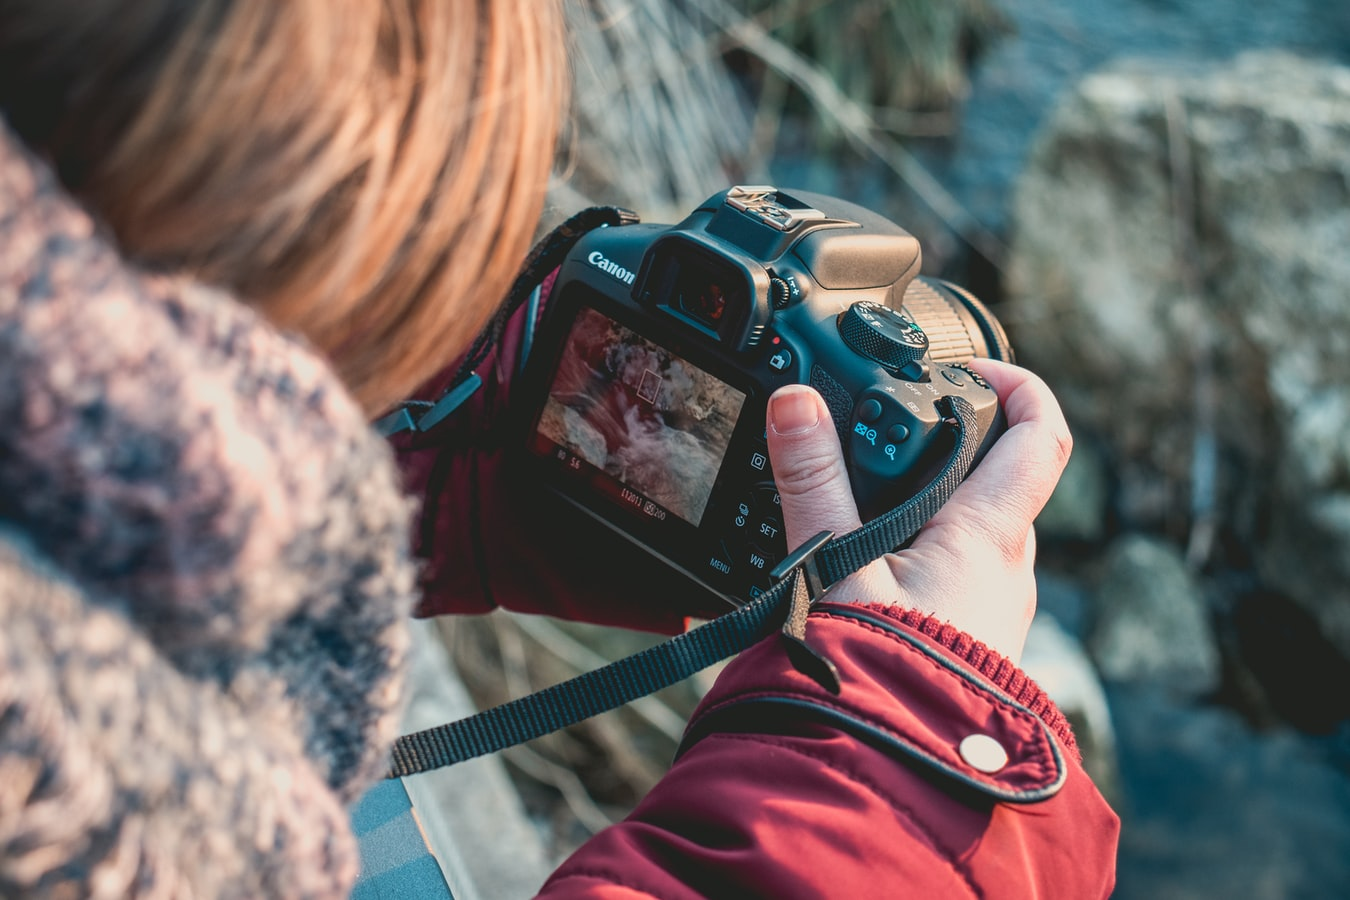 Belajar Fotografi #1 Pengertian Fotografi